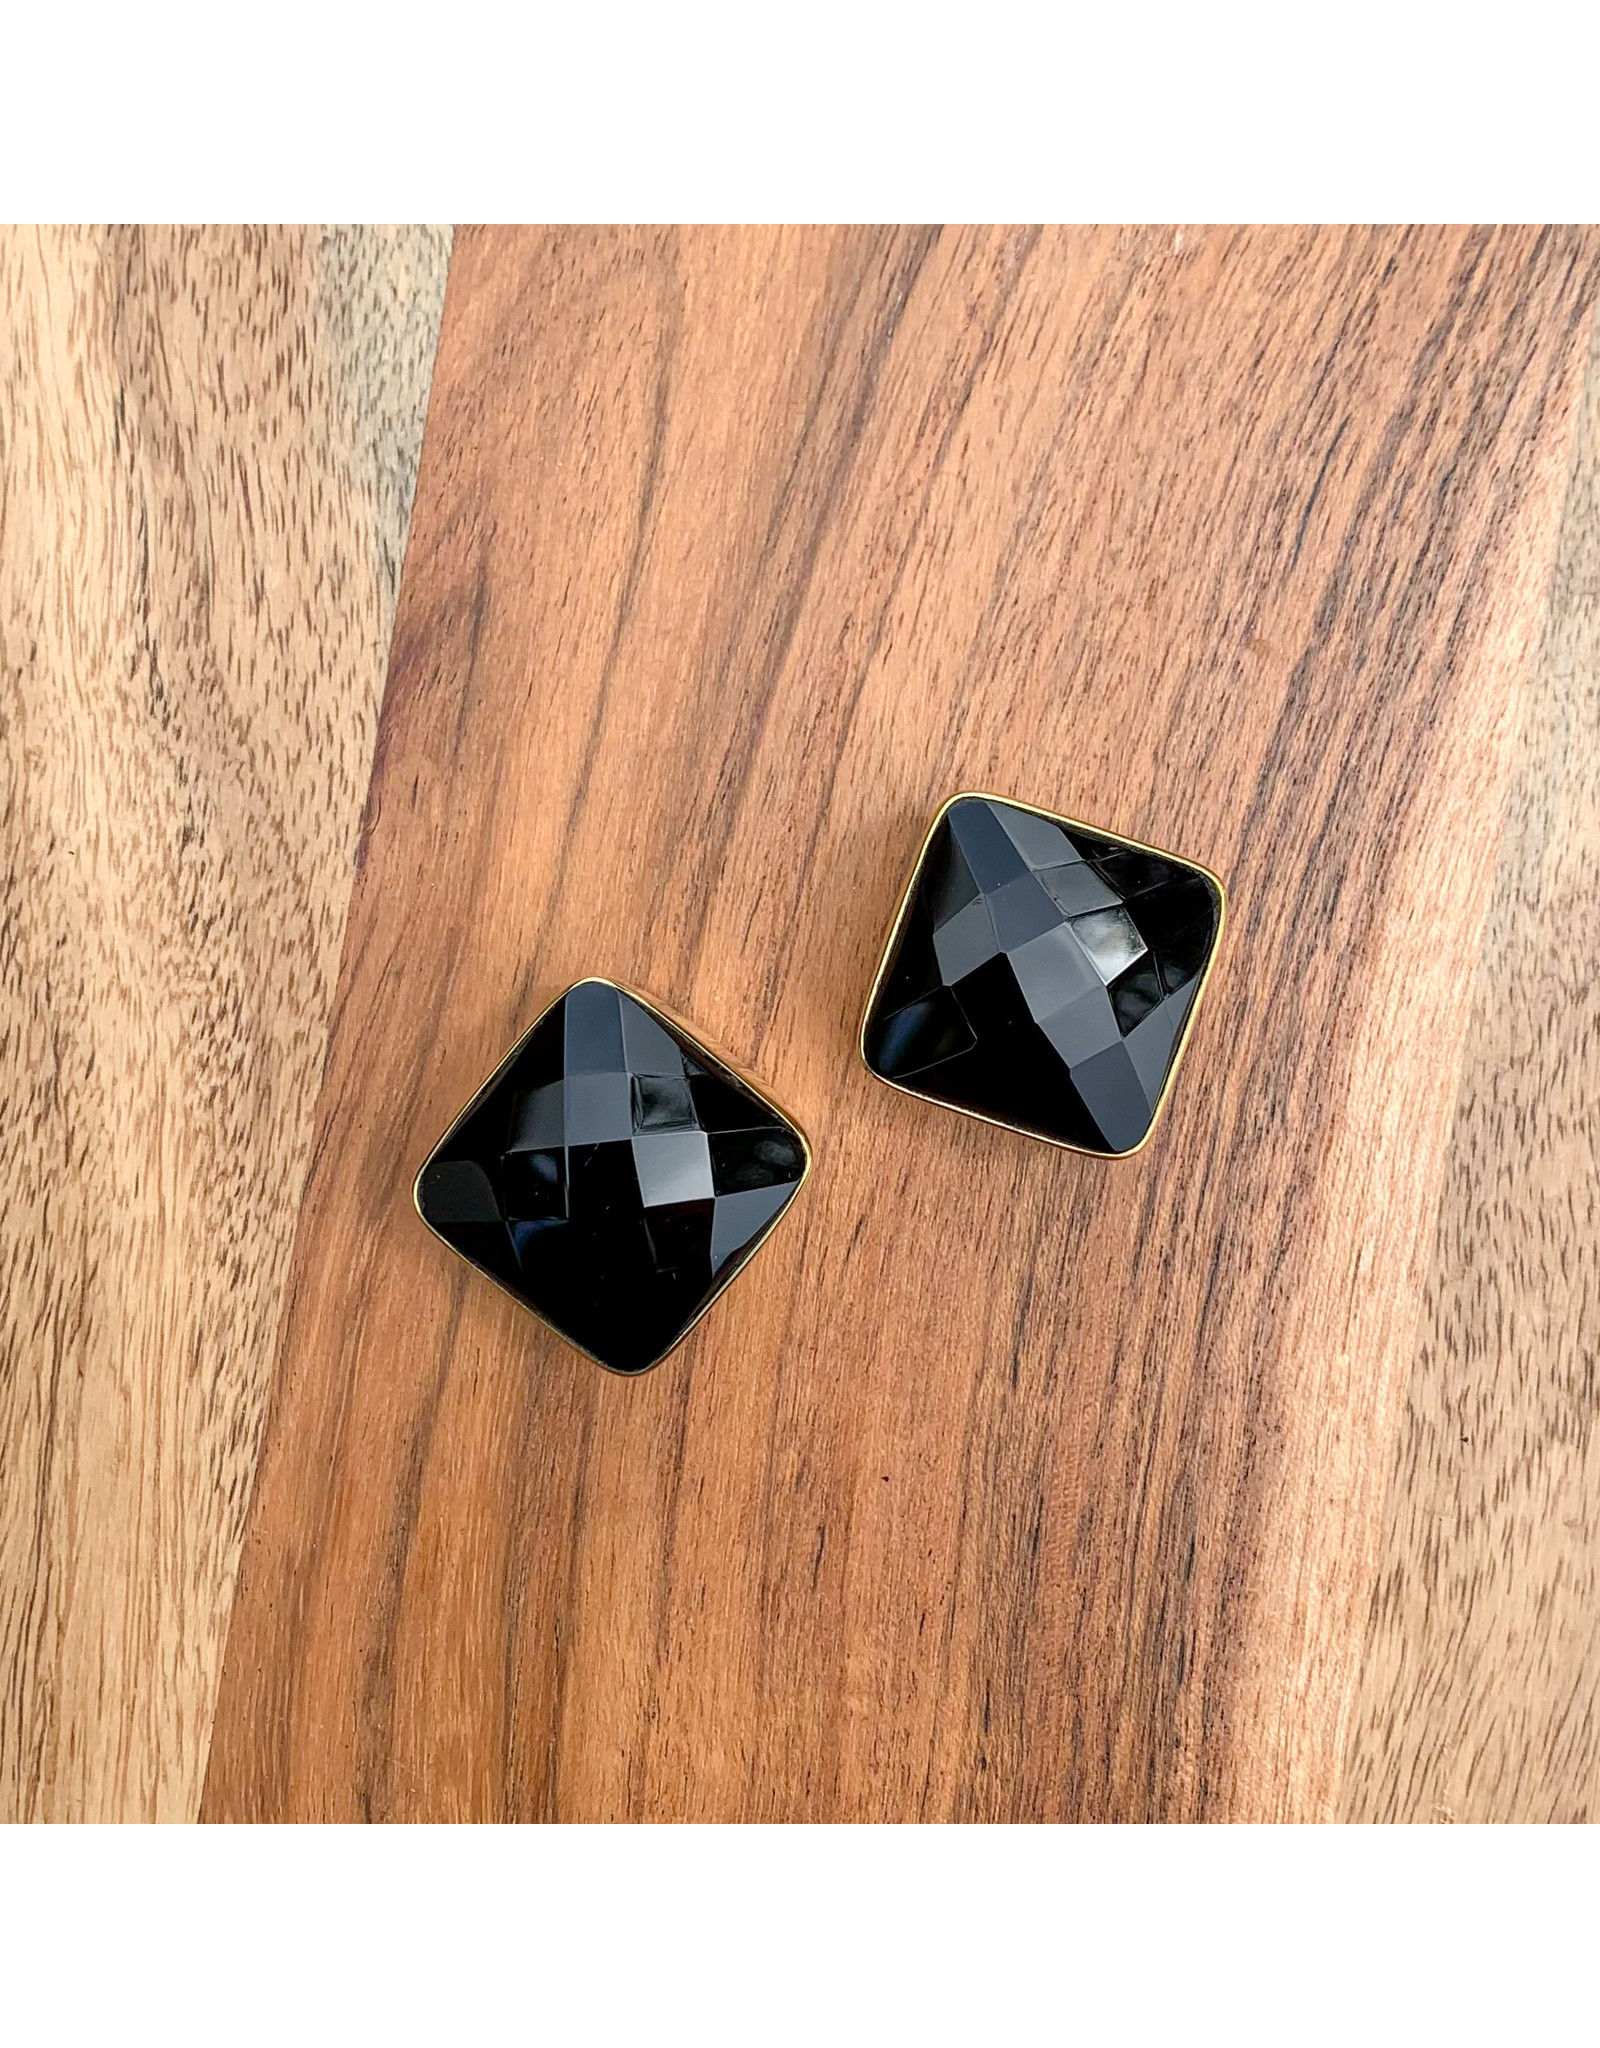 "Diablo Organics Diablo Organics brass ""Cubix"" weights with faceted black obsidian"